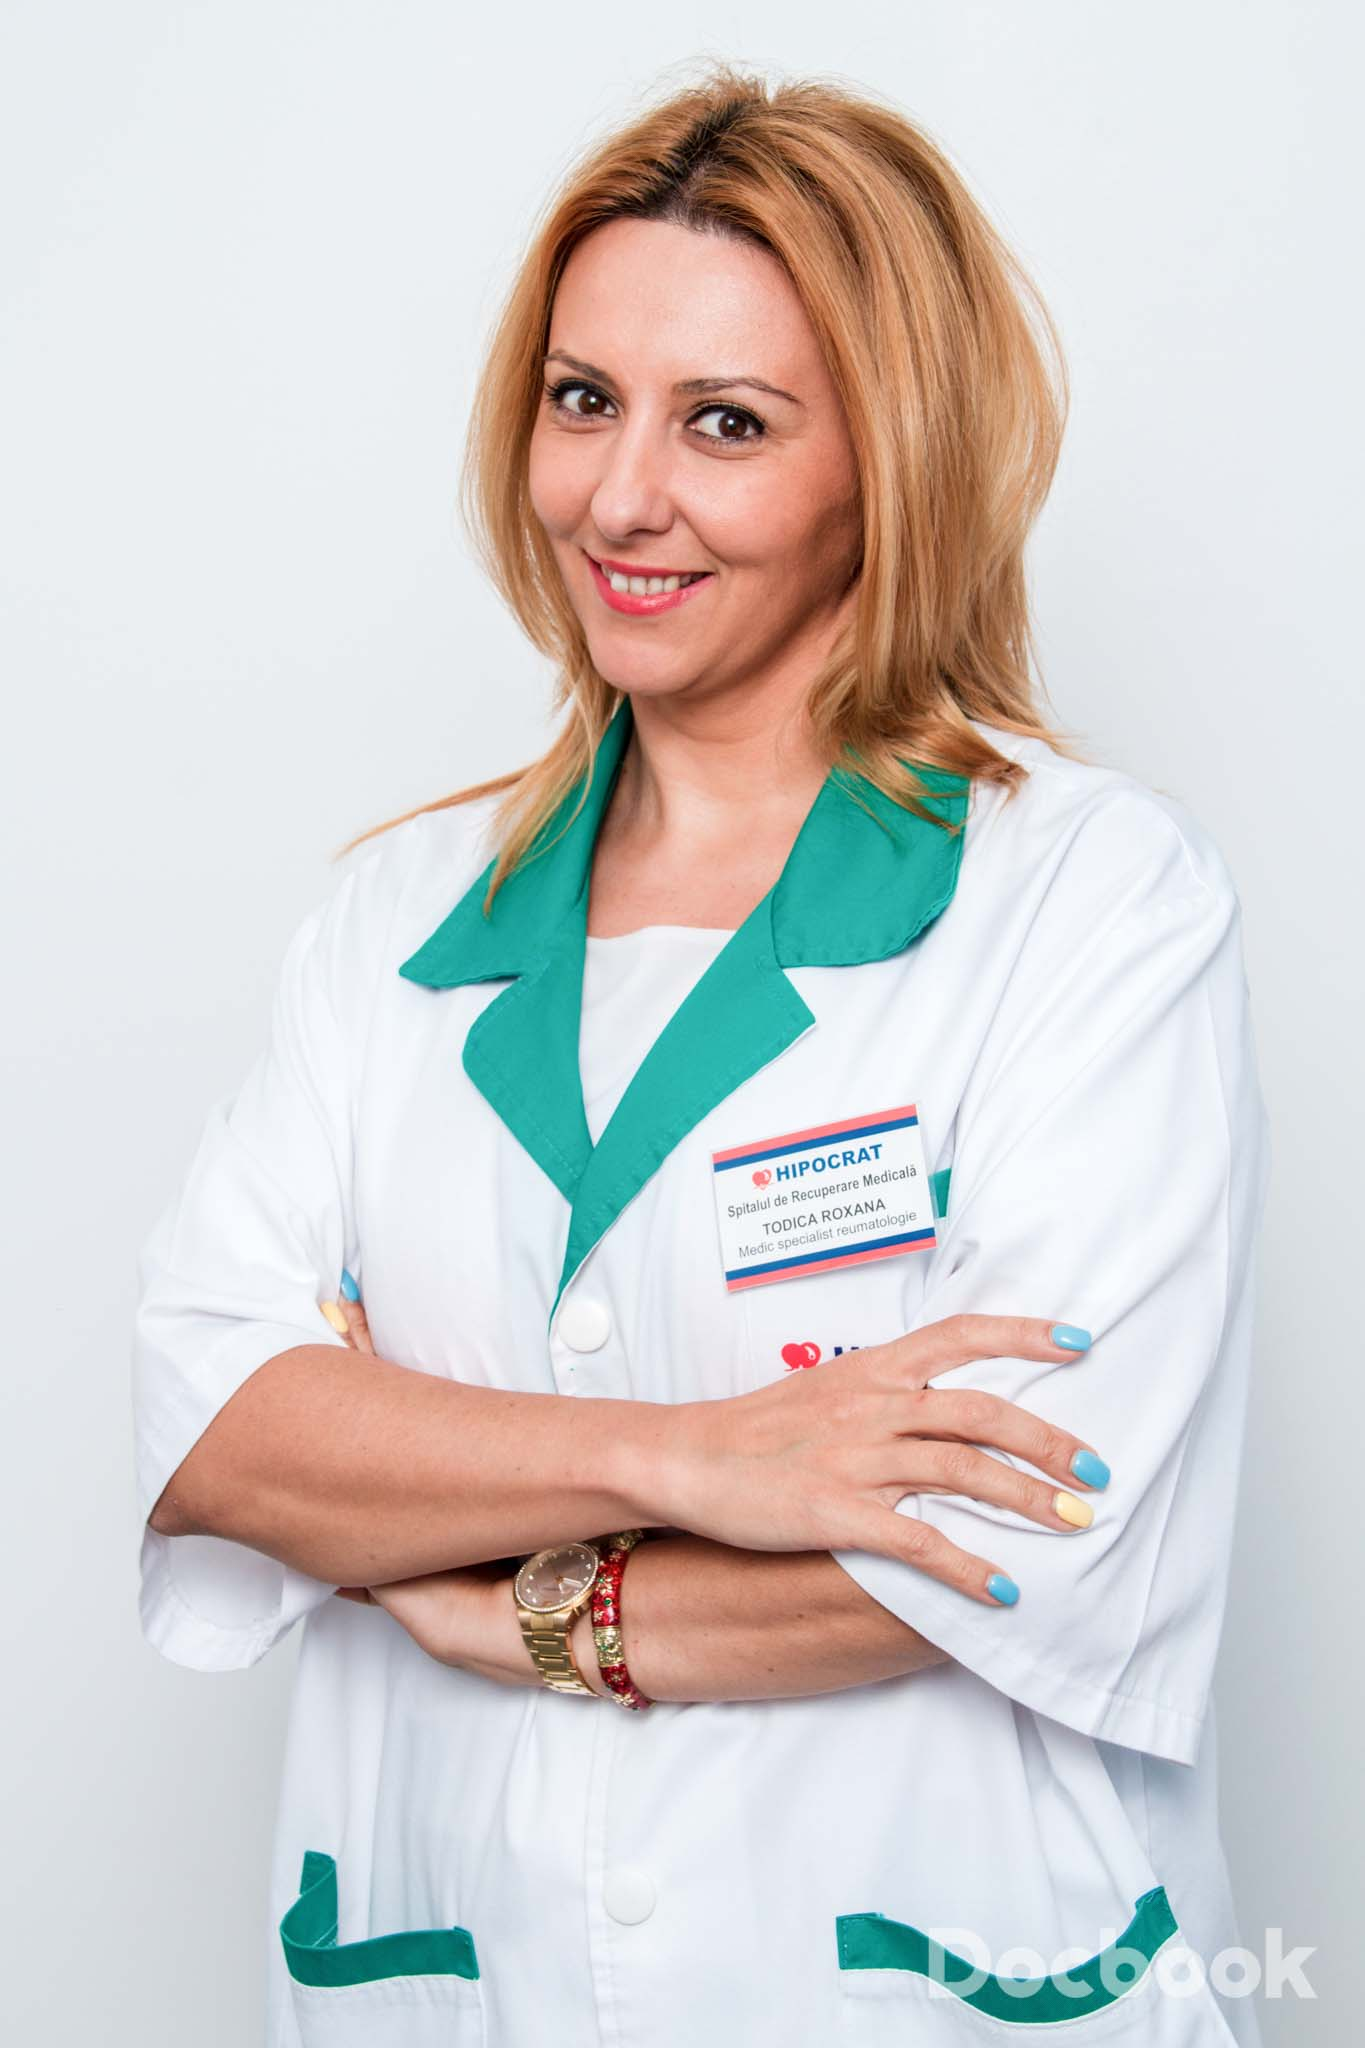 Dr. Roxana Todica